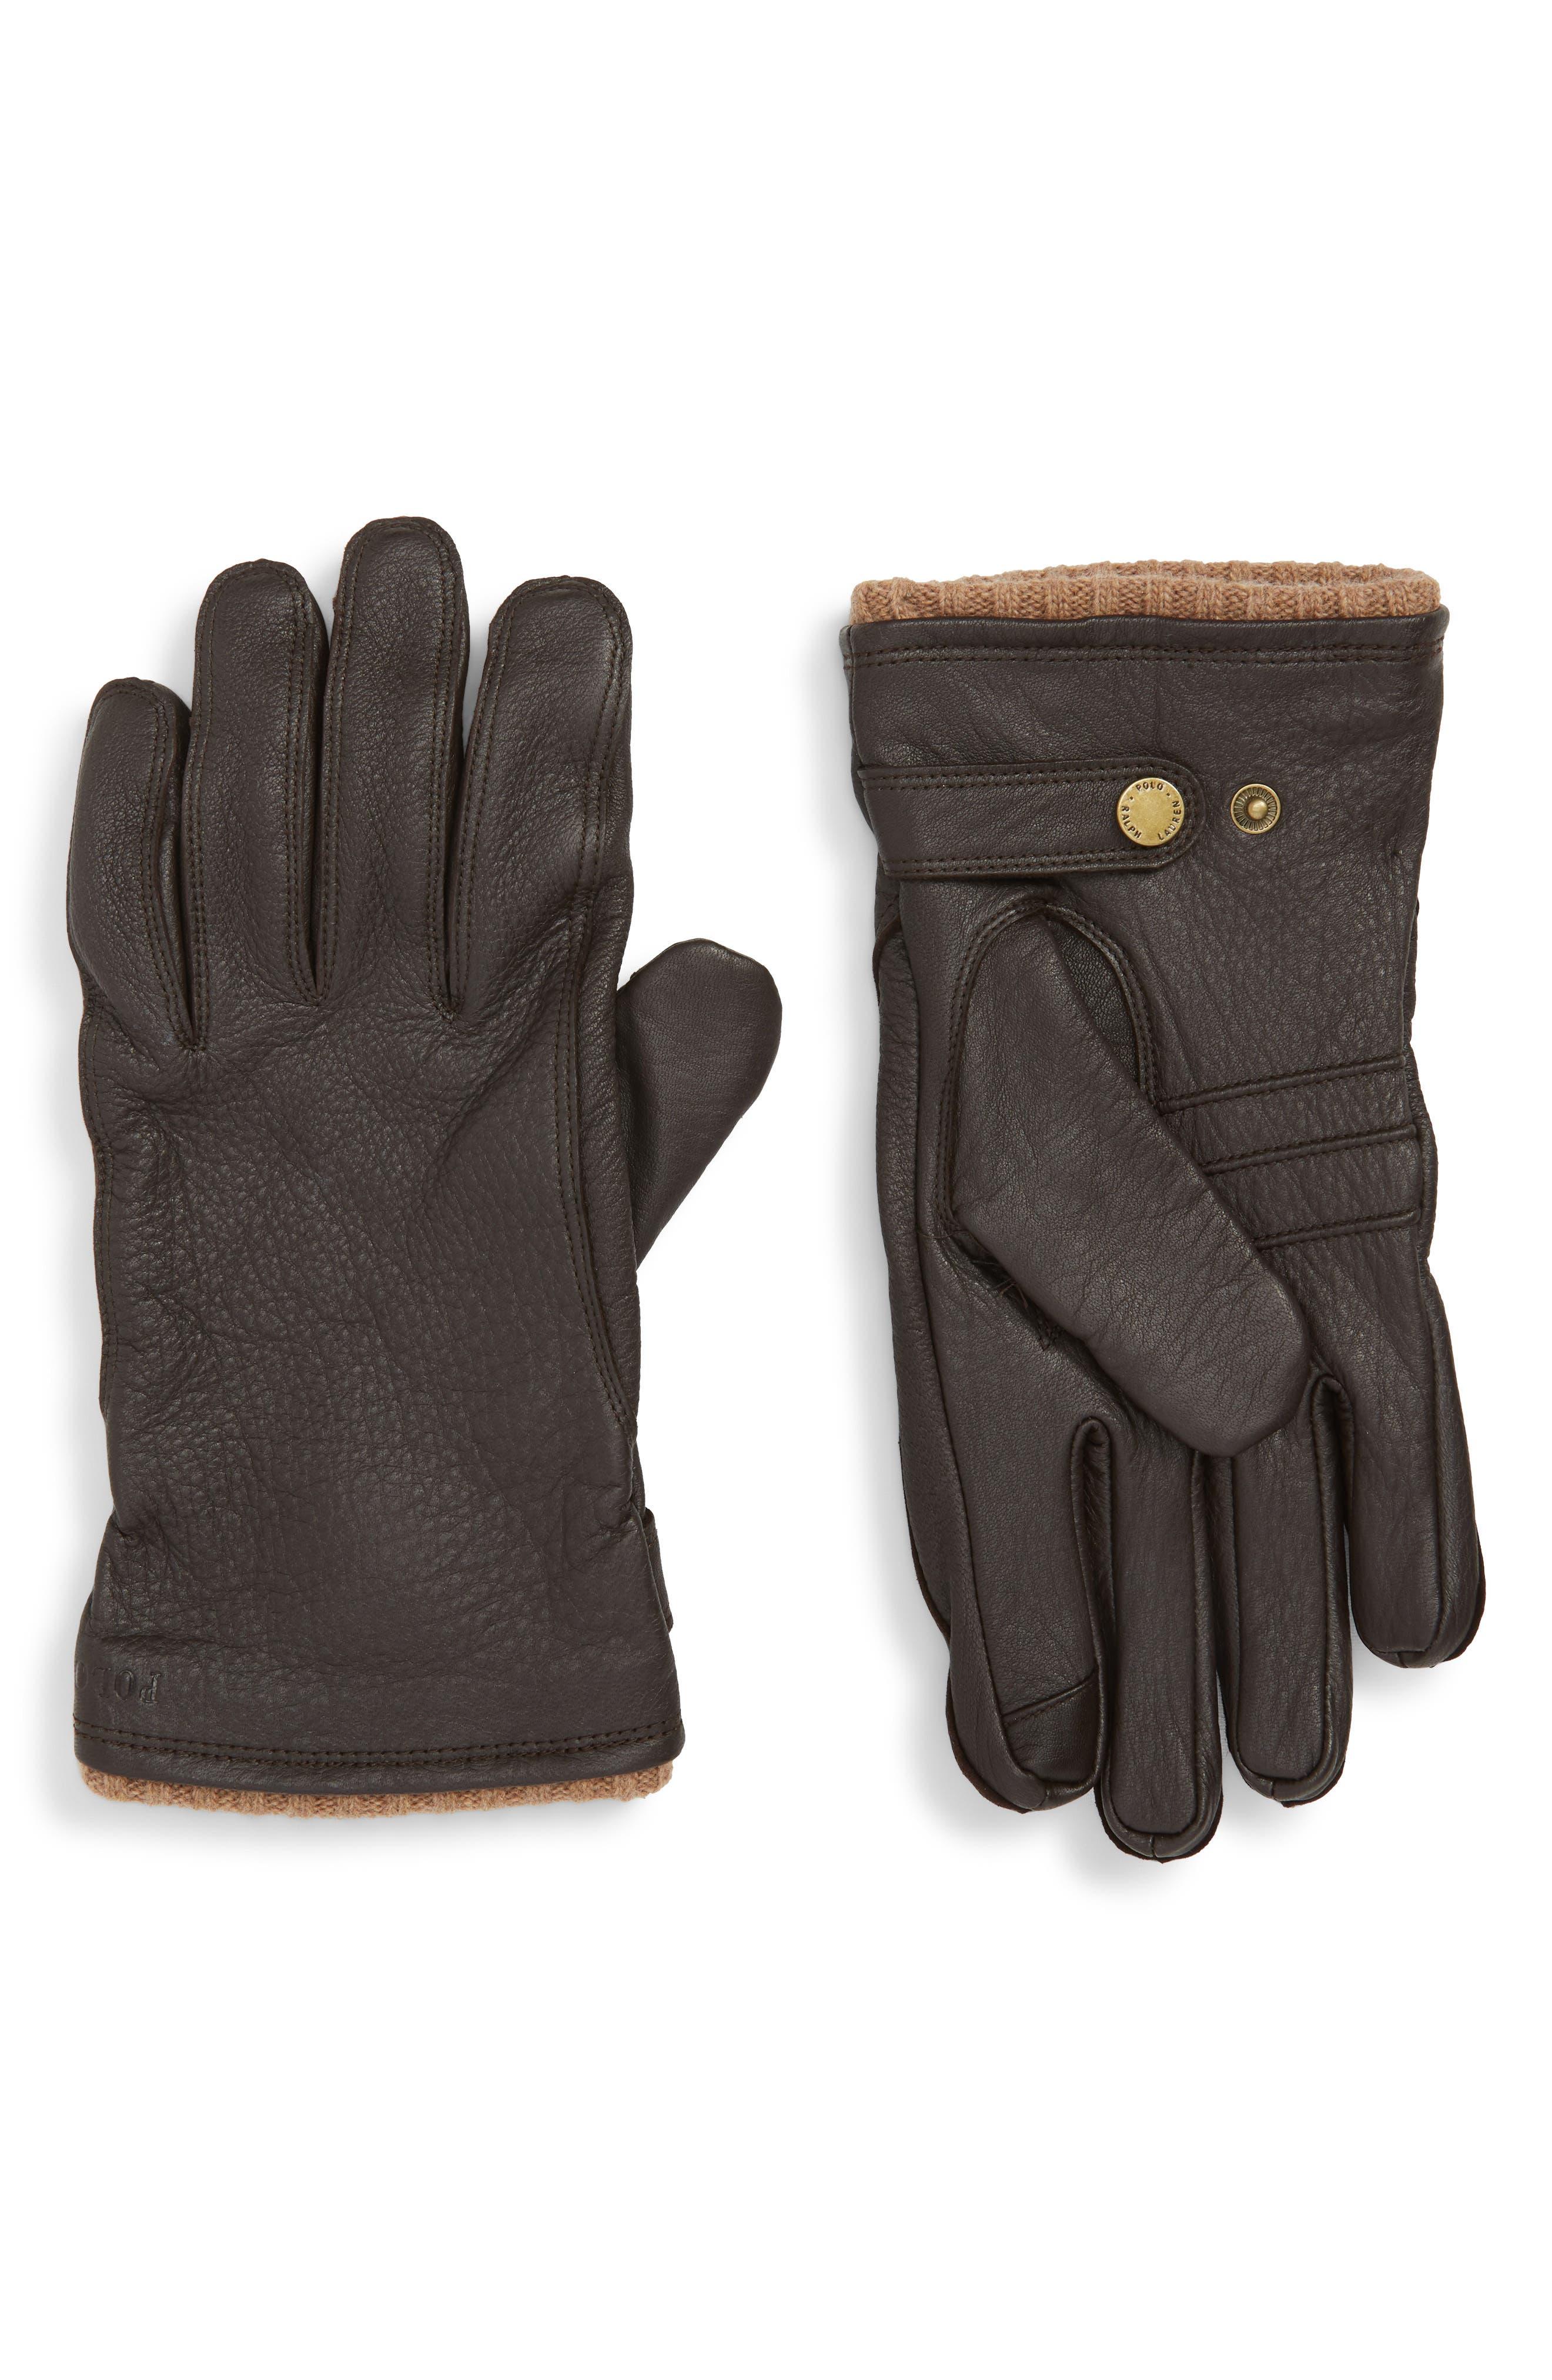 POLO RALPH LAUREN Deerskin Gloves, Main, color, CIRCUIT BROWN